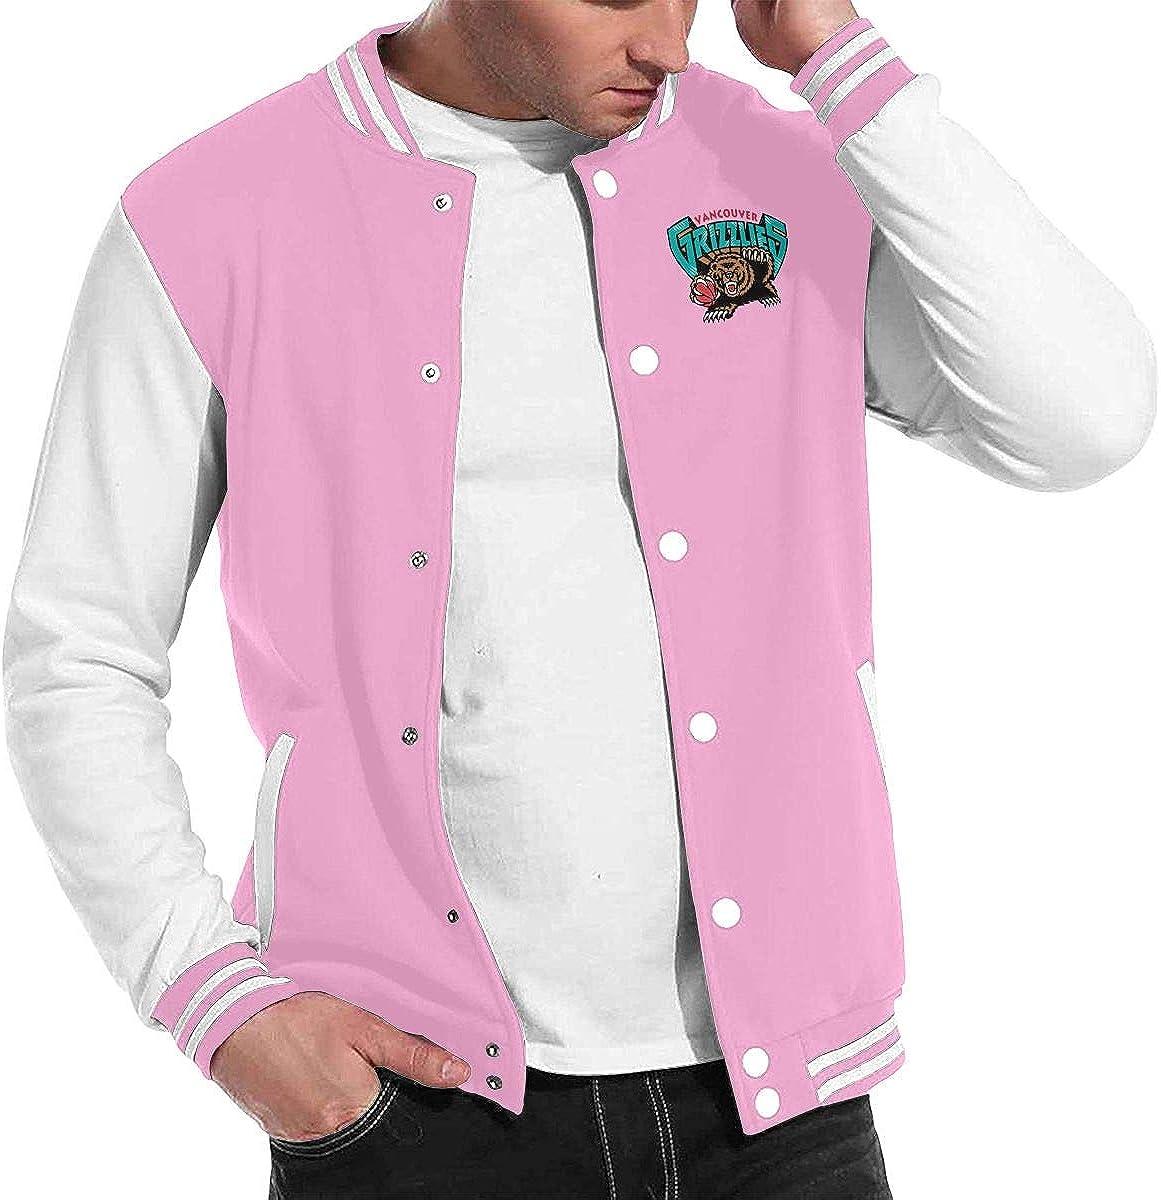 Stan-Lee Unisex Baseball Jacket Sport Coat Trendy Soft And Comfortable